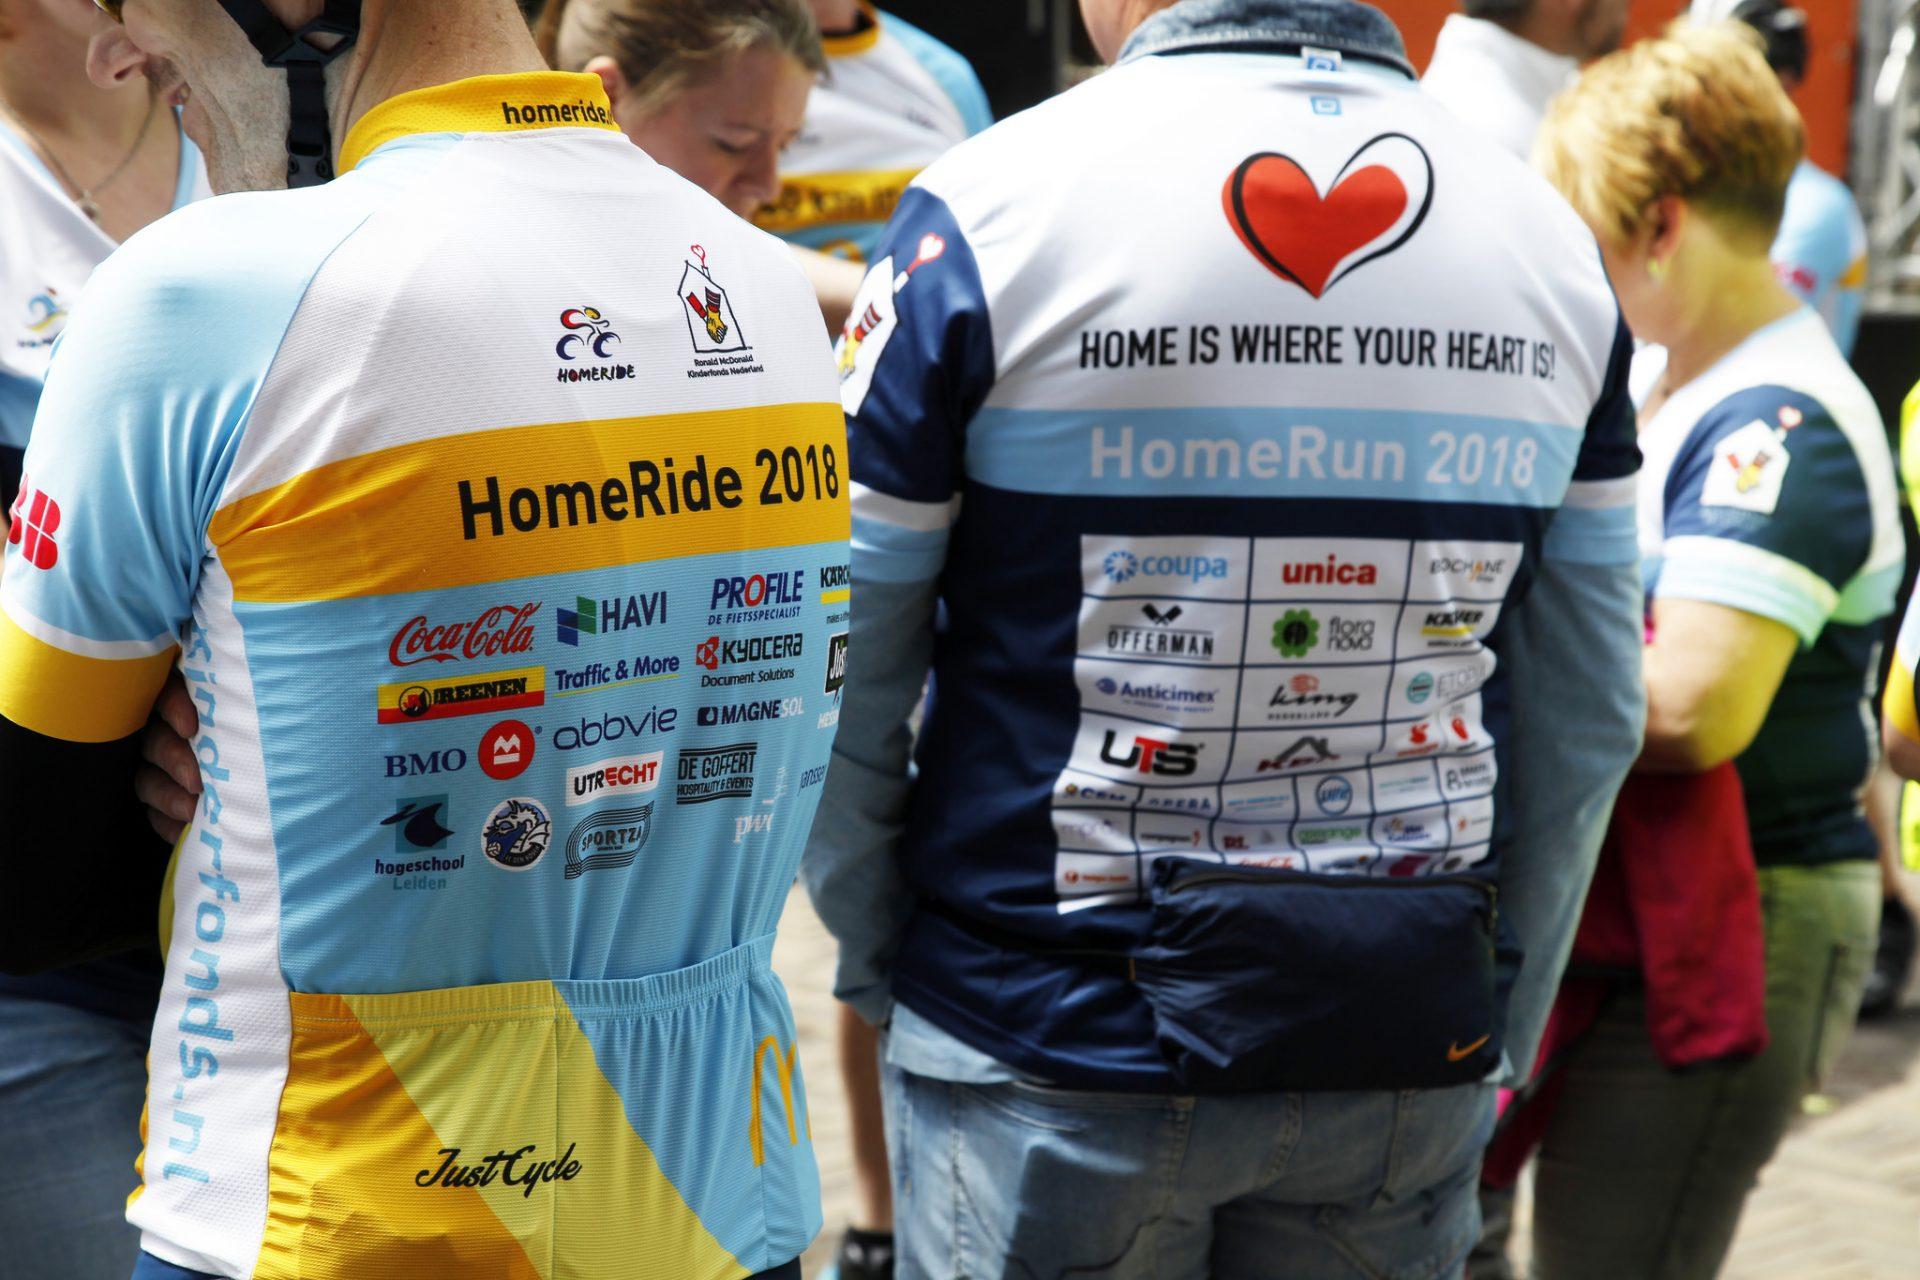 UTS Verkroost - ISS Homerun sponsoring shirts